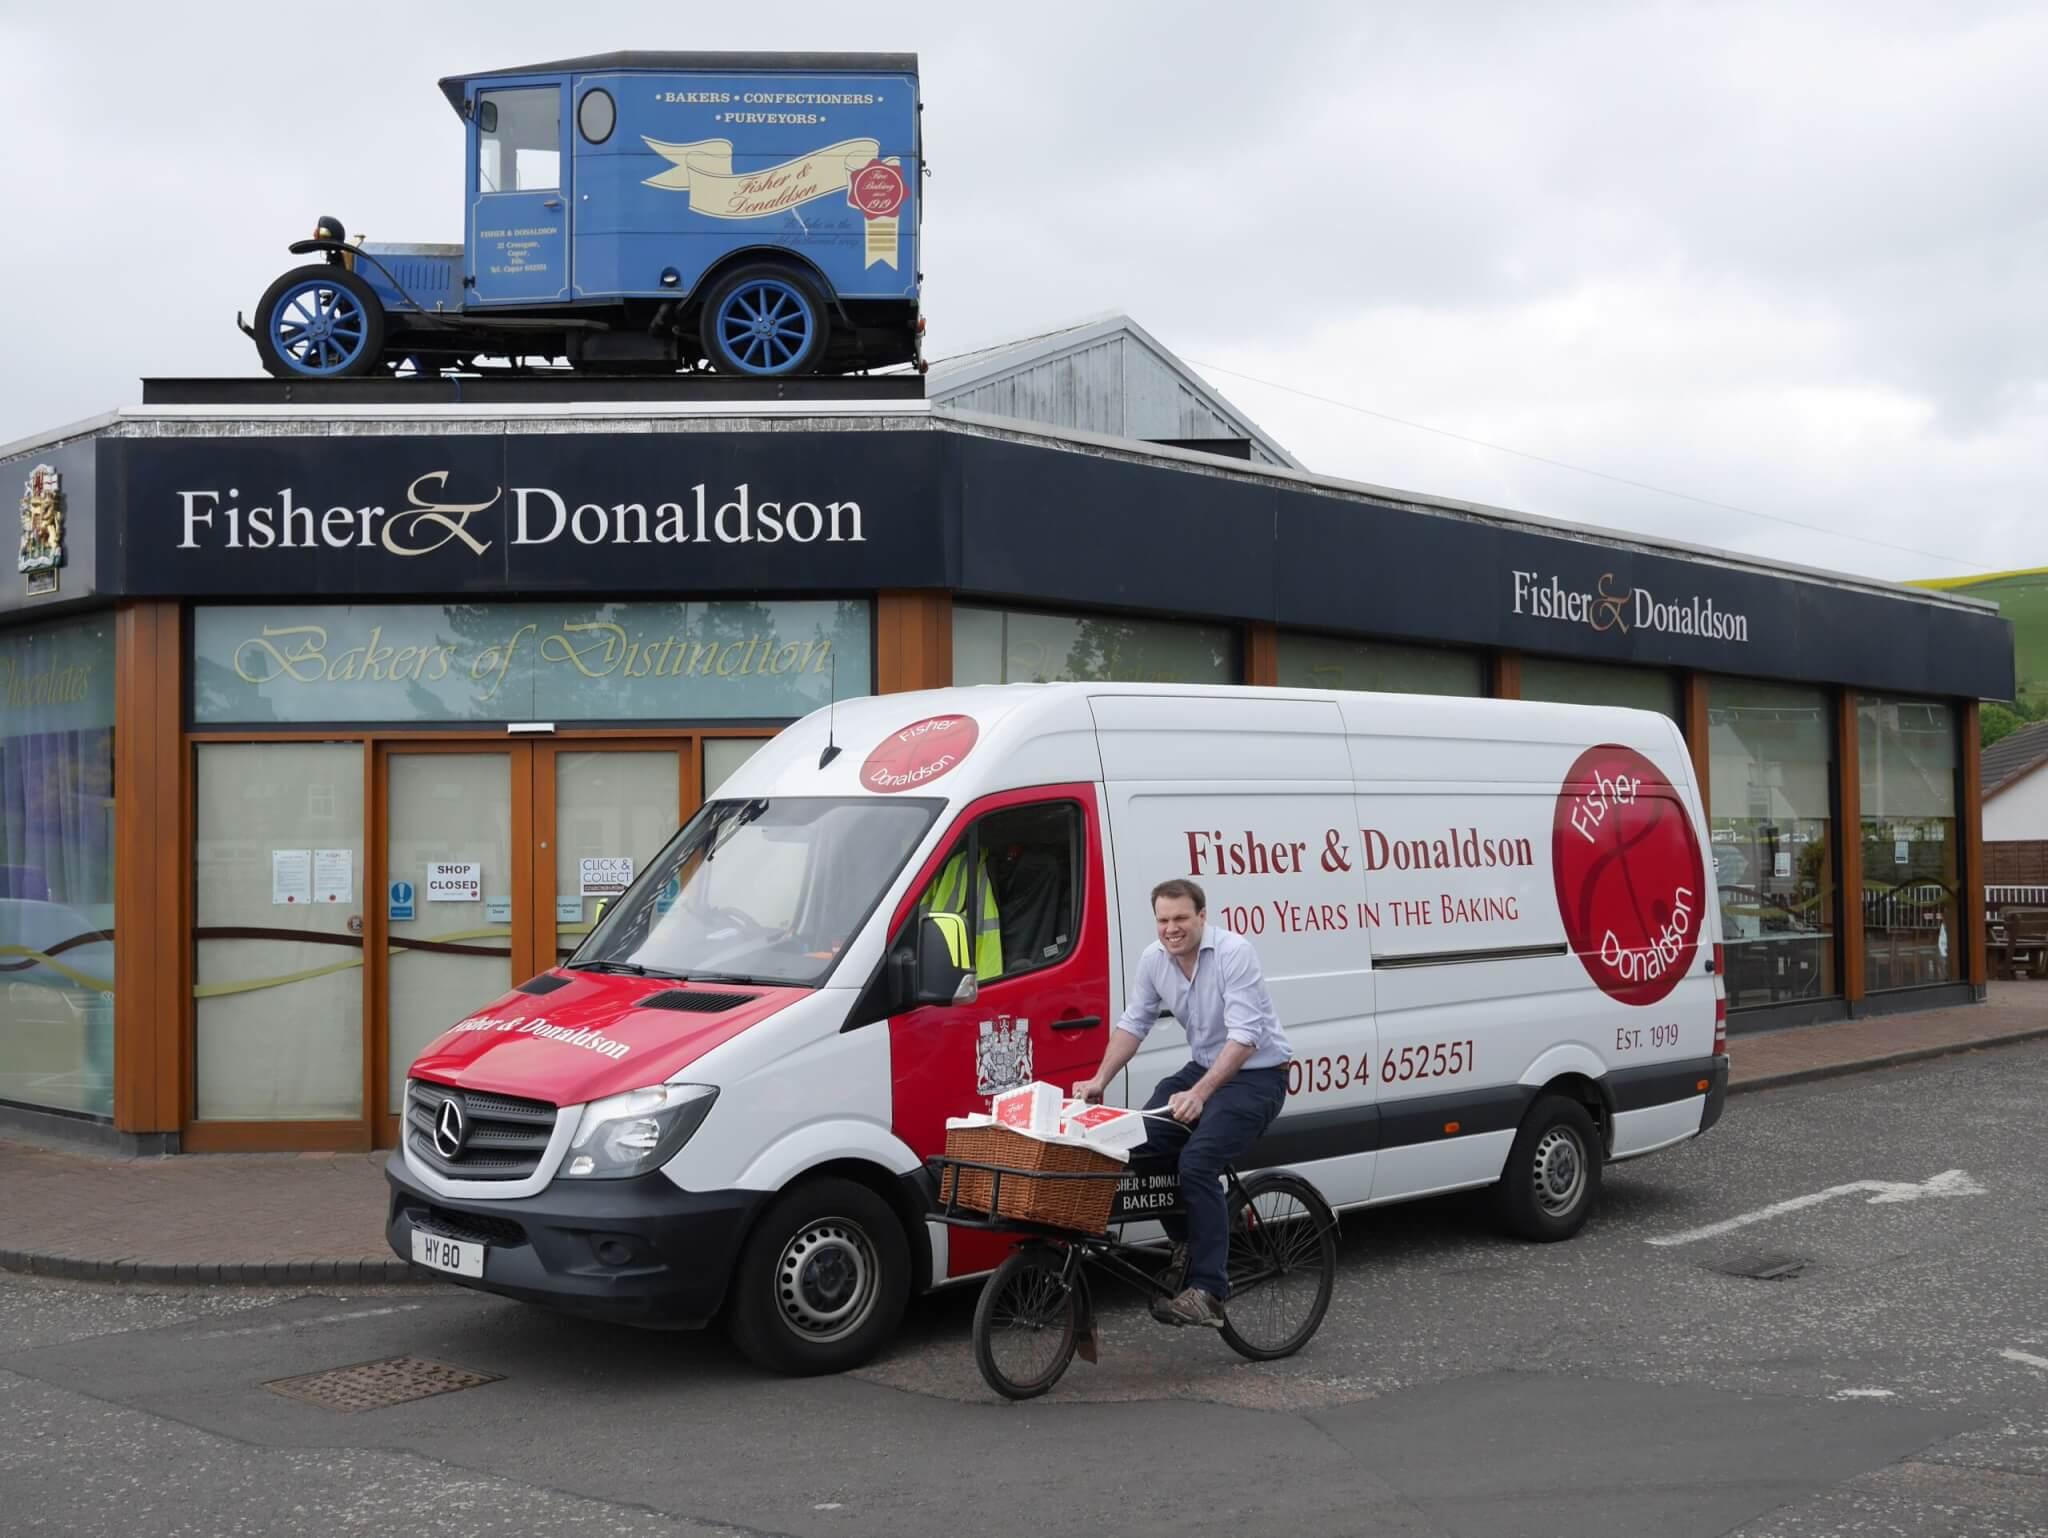 Scottish bakery creates 'Class of 2020' celebration platter